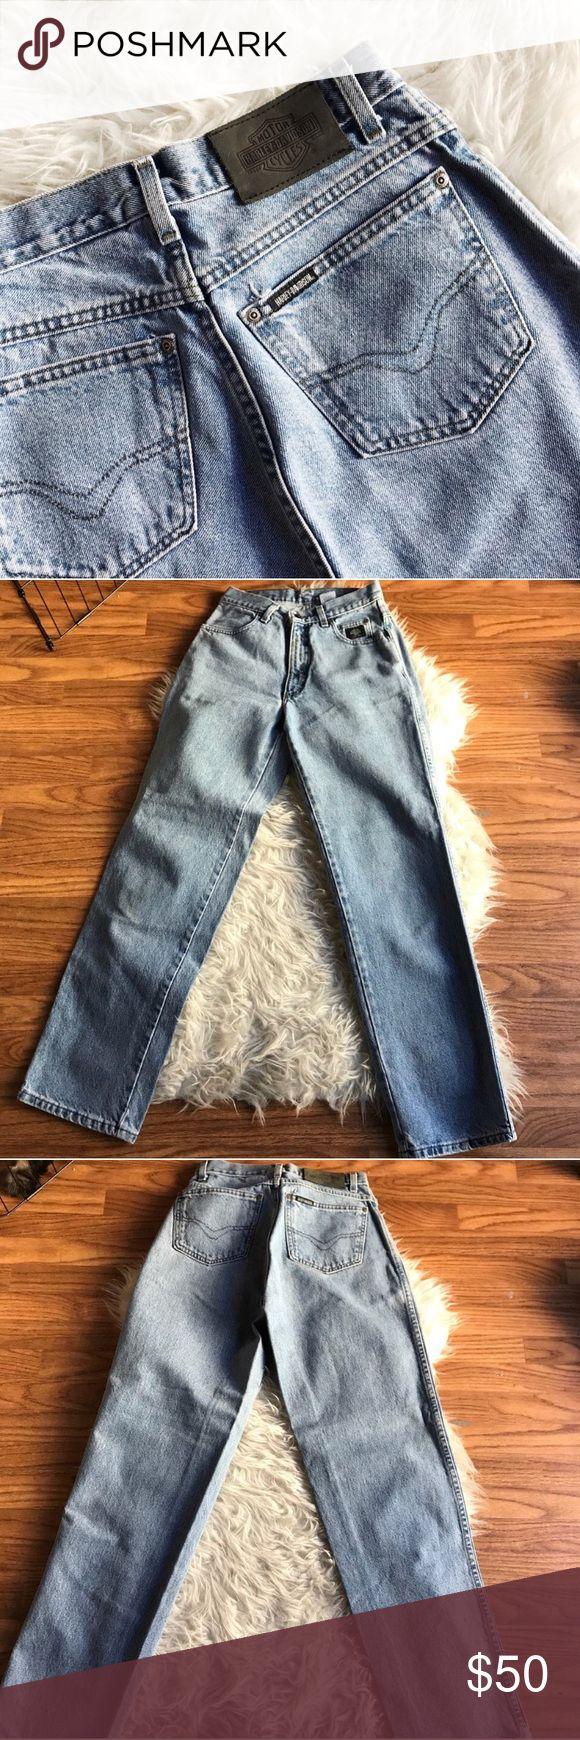 "Vintage high waisted Harley Davidson jeans Vintage high waisted Harley Davidson jeans 😭💗 in amaaazing condition!  Measurements: Around waist: 28"" Waist laying flat: 14"" Hips laying flat: 19"" Around hips: 38"" Length of leg: 42"" Inseam: 31.5"" Front rise: 11"" Back rise: 16"" Harley-Davidson Jeans Straight Leg"